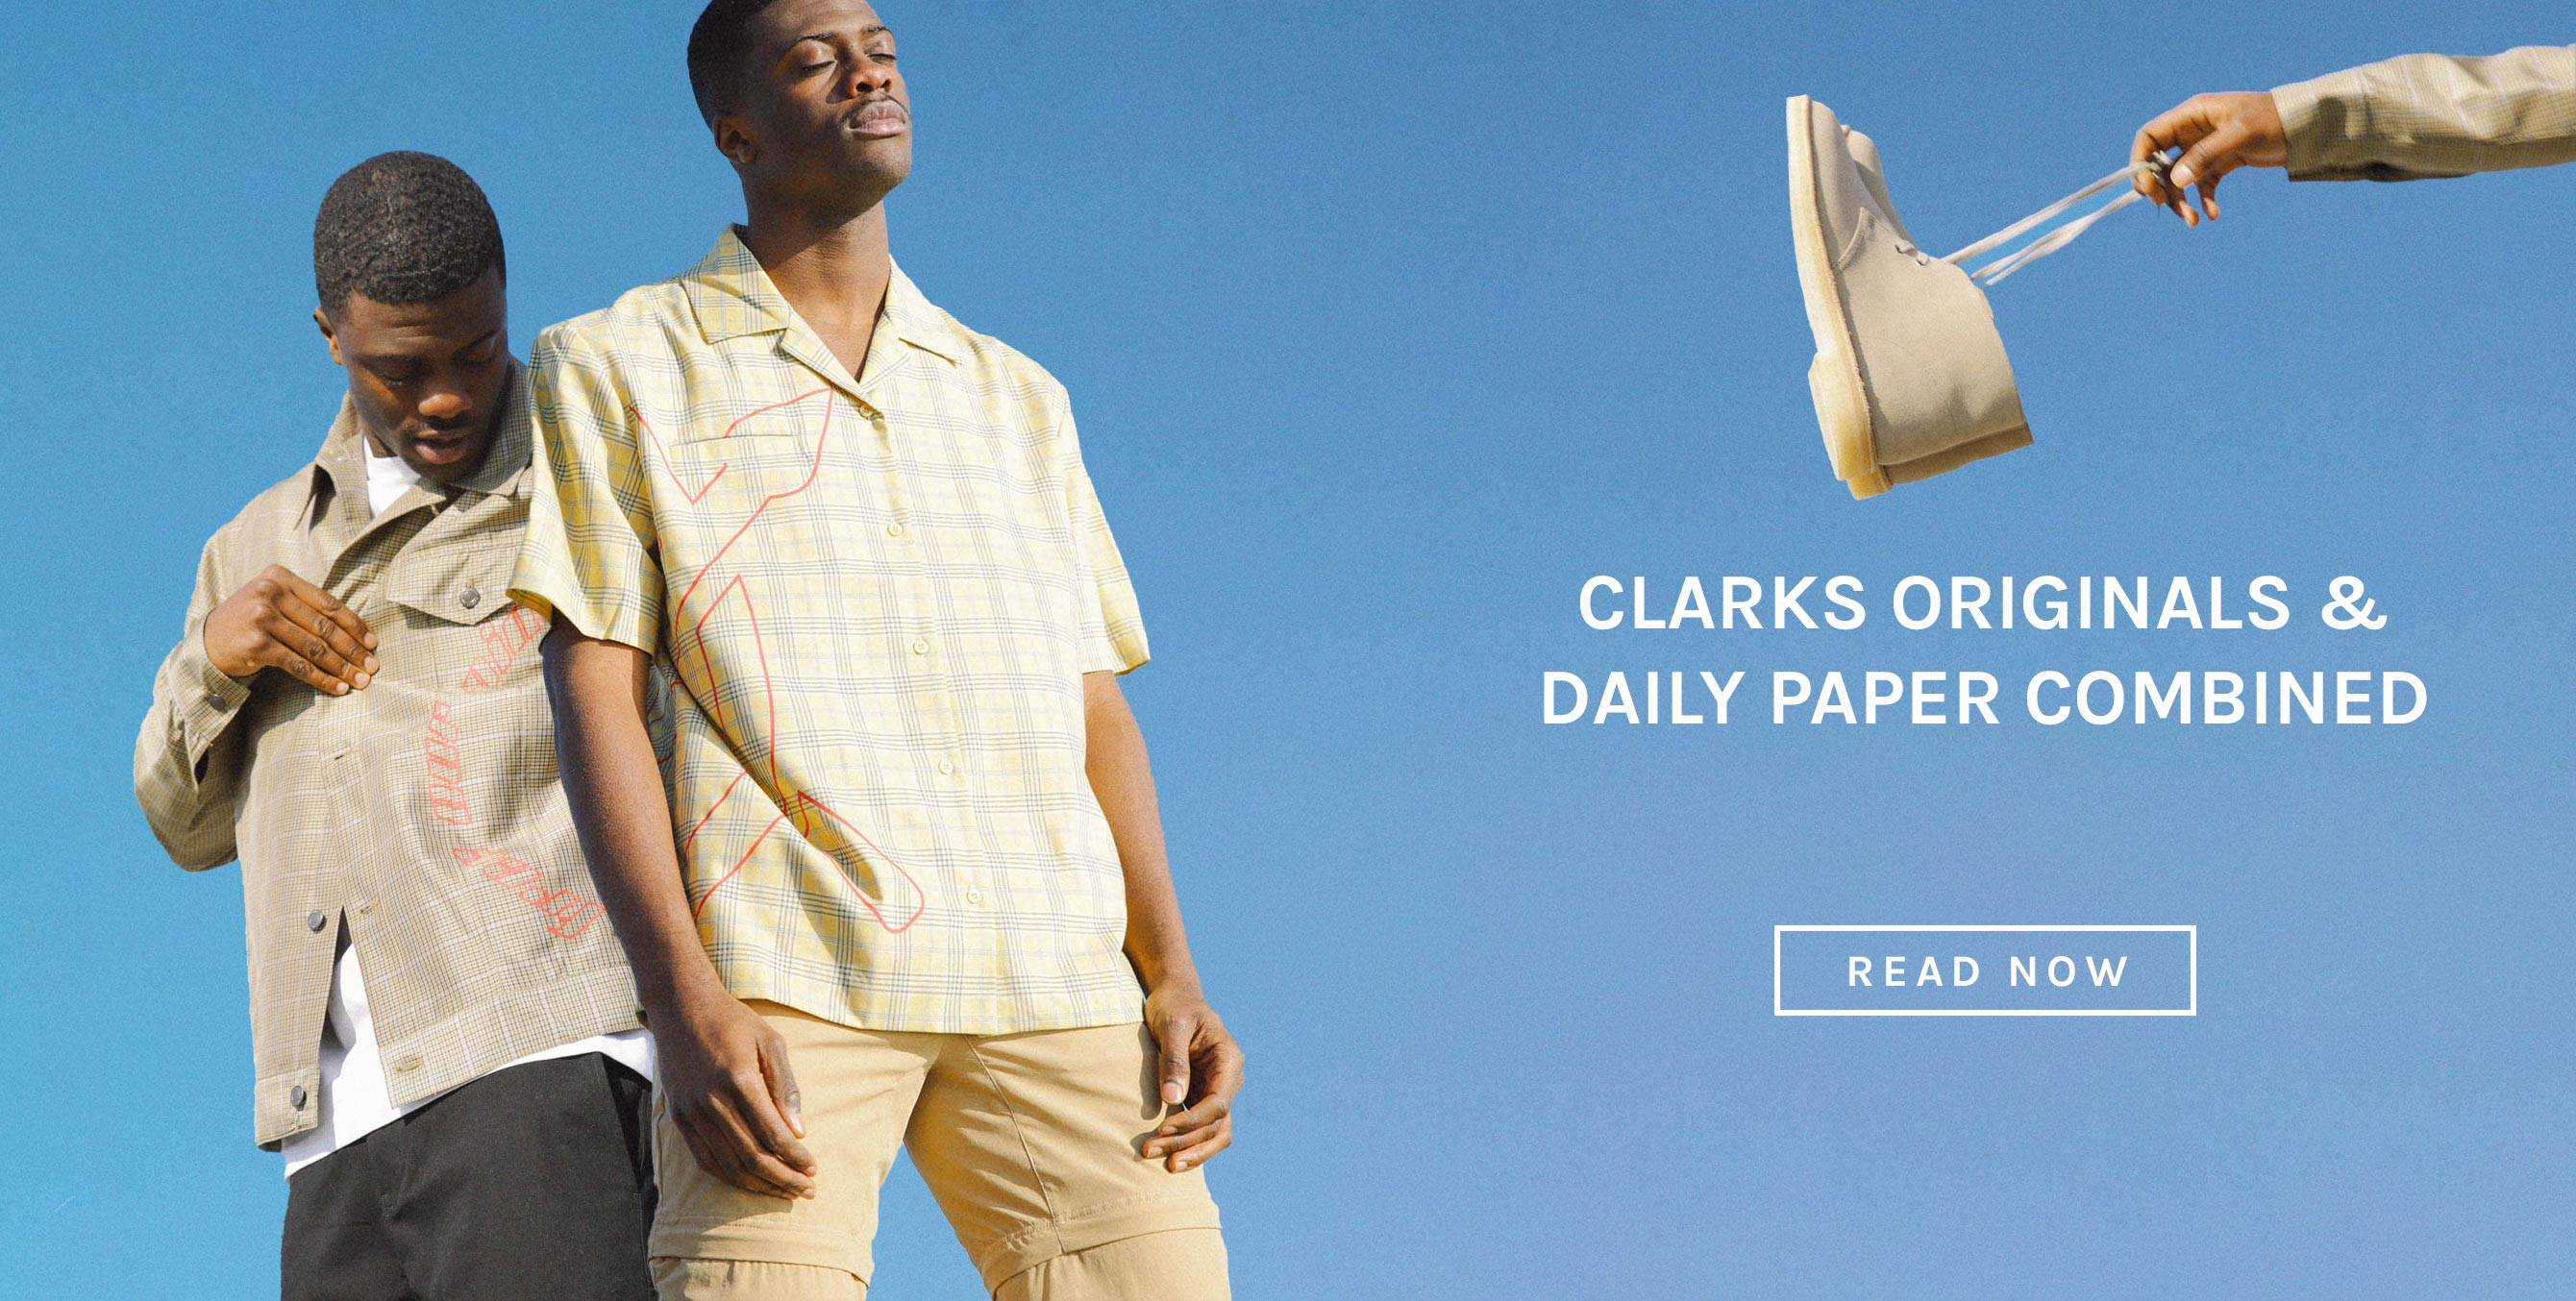 Clarks Originals & Daily Paper